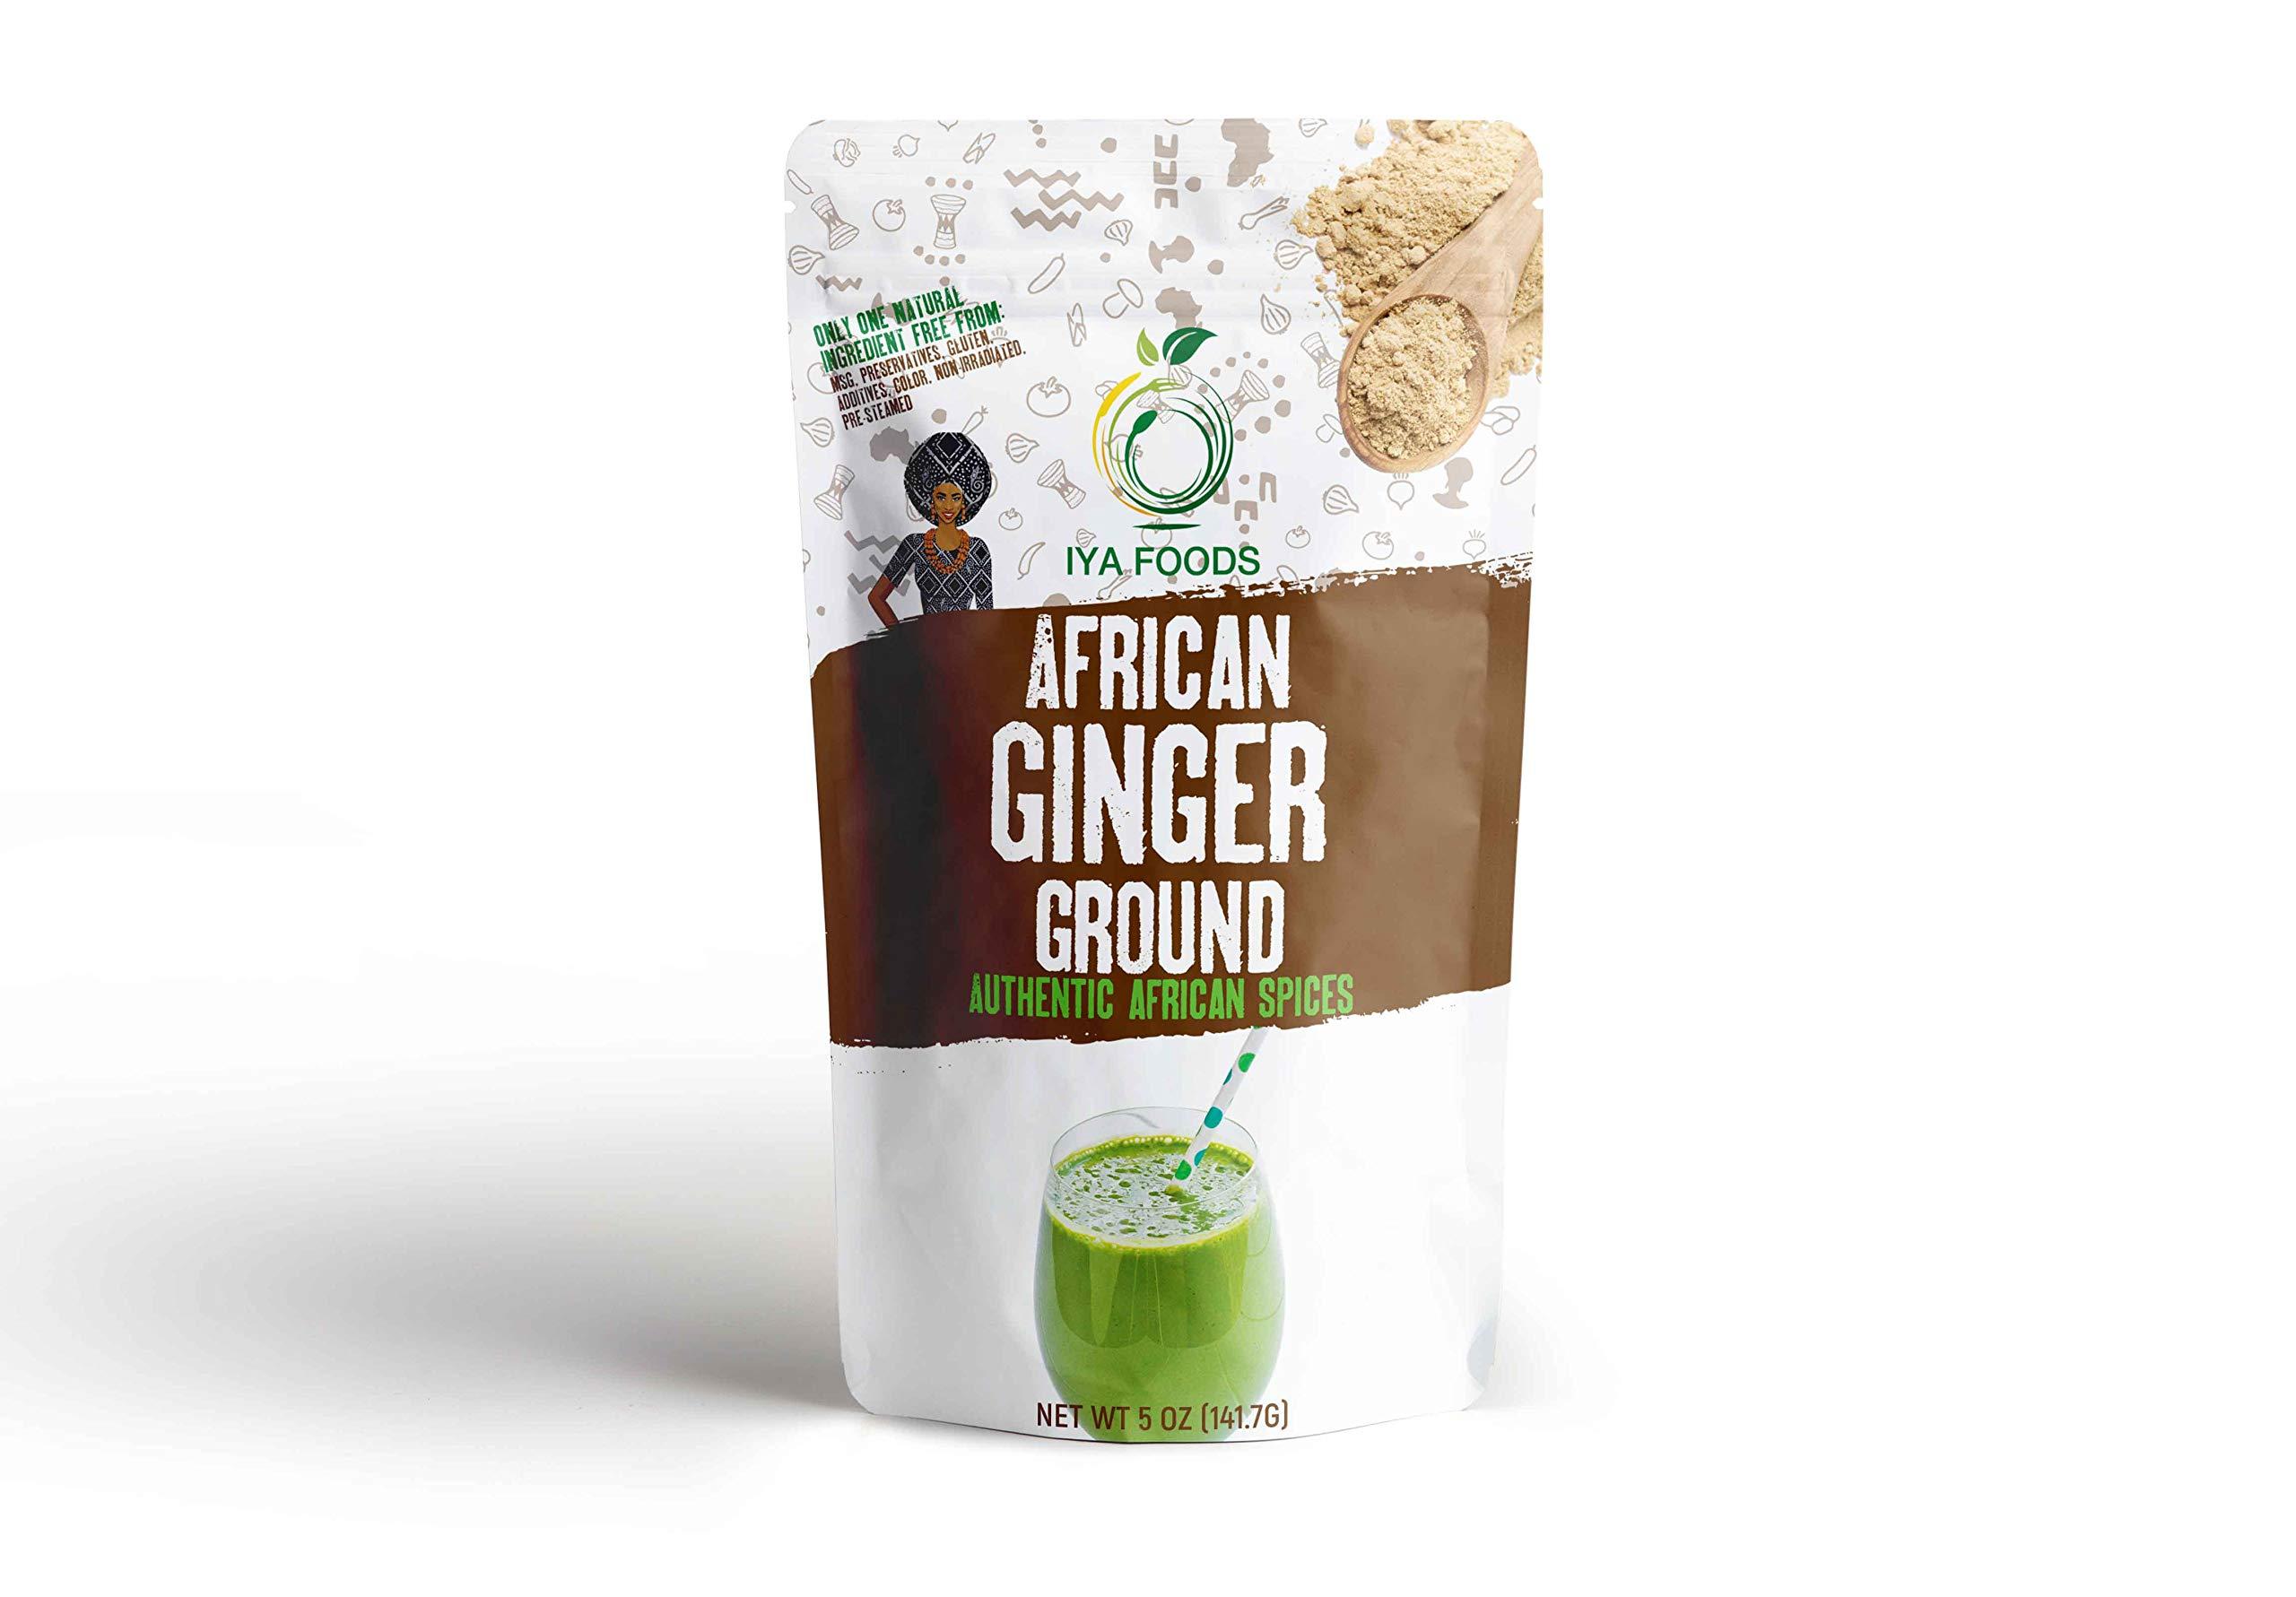 Iya Foods Ginger Ground 5 ounces, Kosher Certified, No Preservatives, No Added Color, No Additives, No MSG